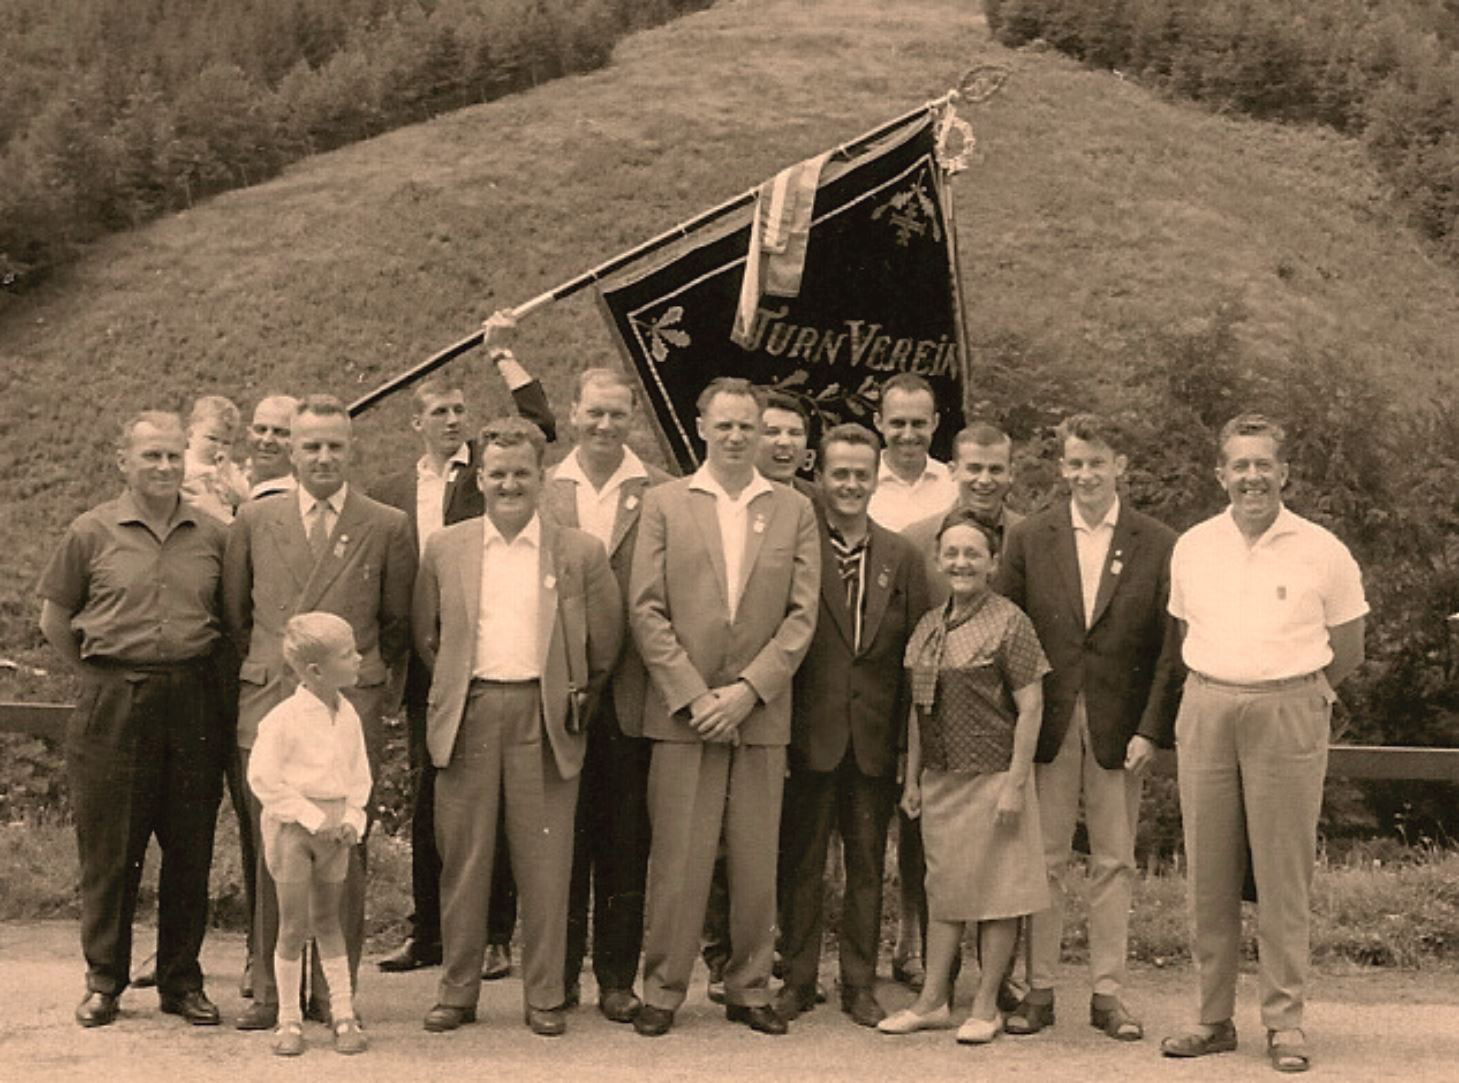 Chronik des Turnverein Langenbrand 1966-1970 (1)